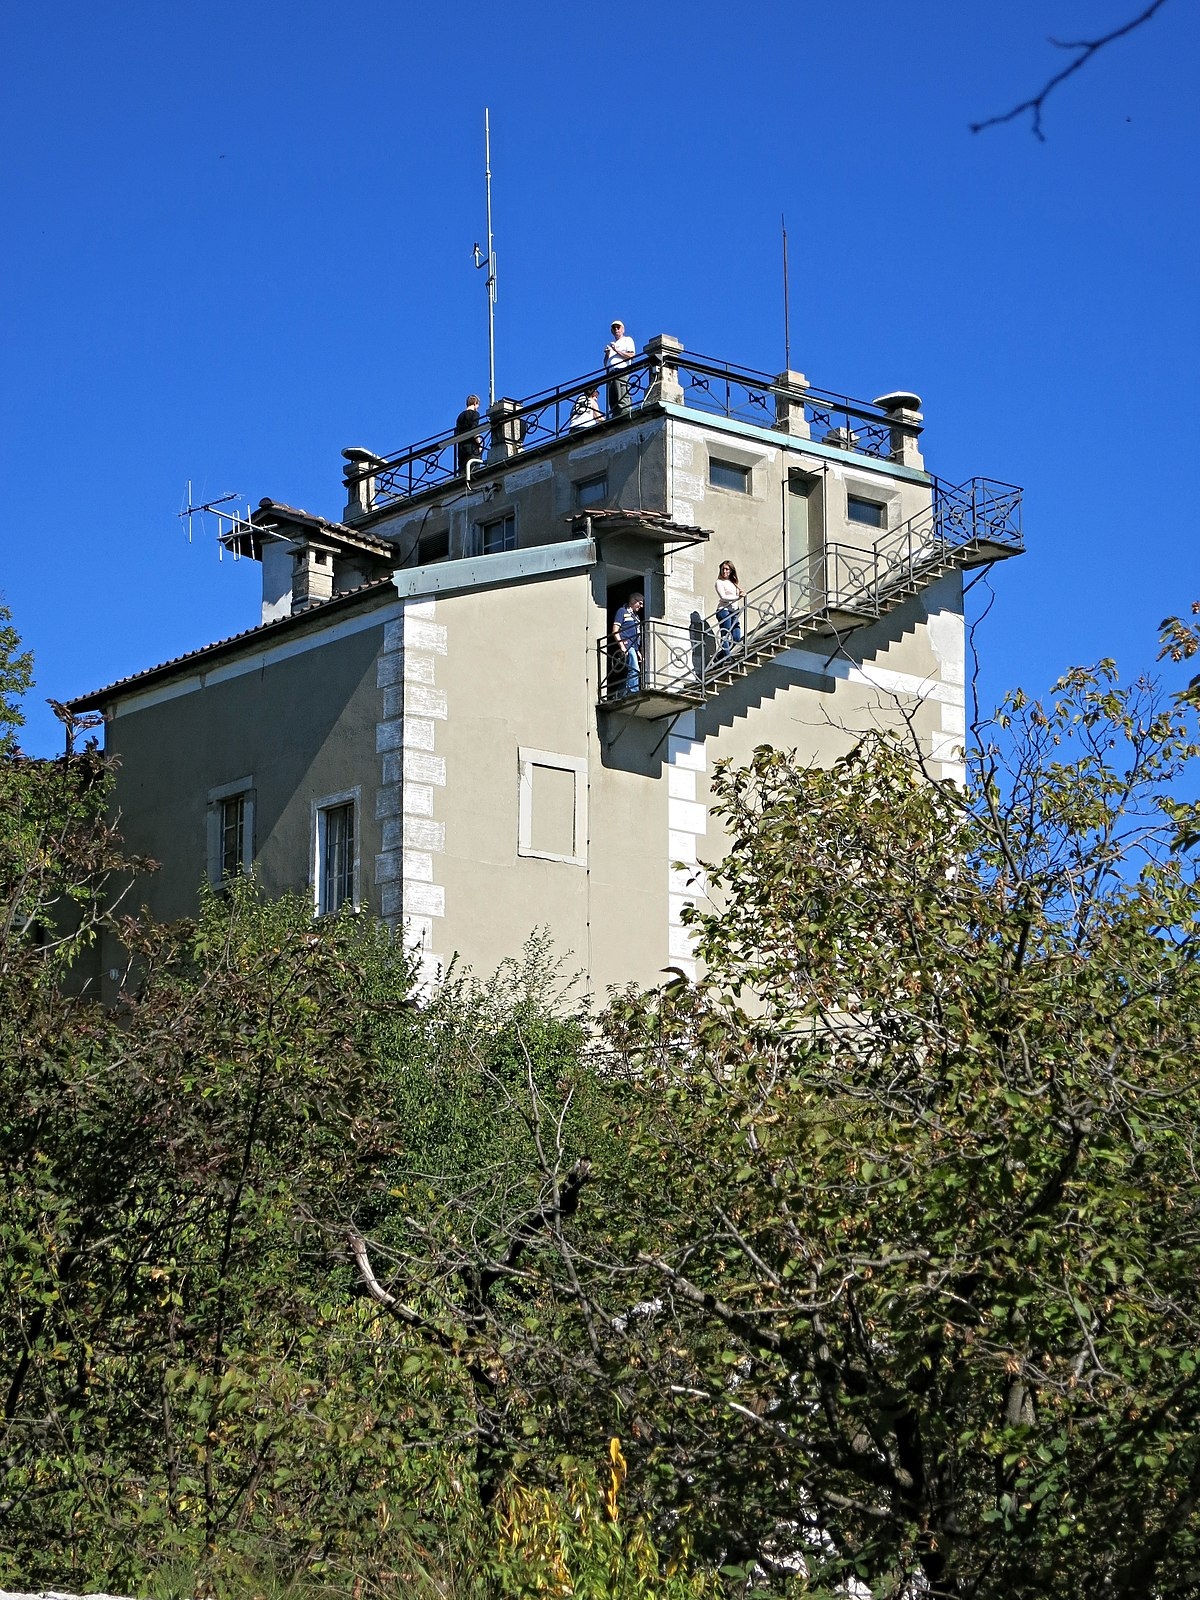 Aussichtsturm monte san salvatore wikipedia for Mobilia san salvatore